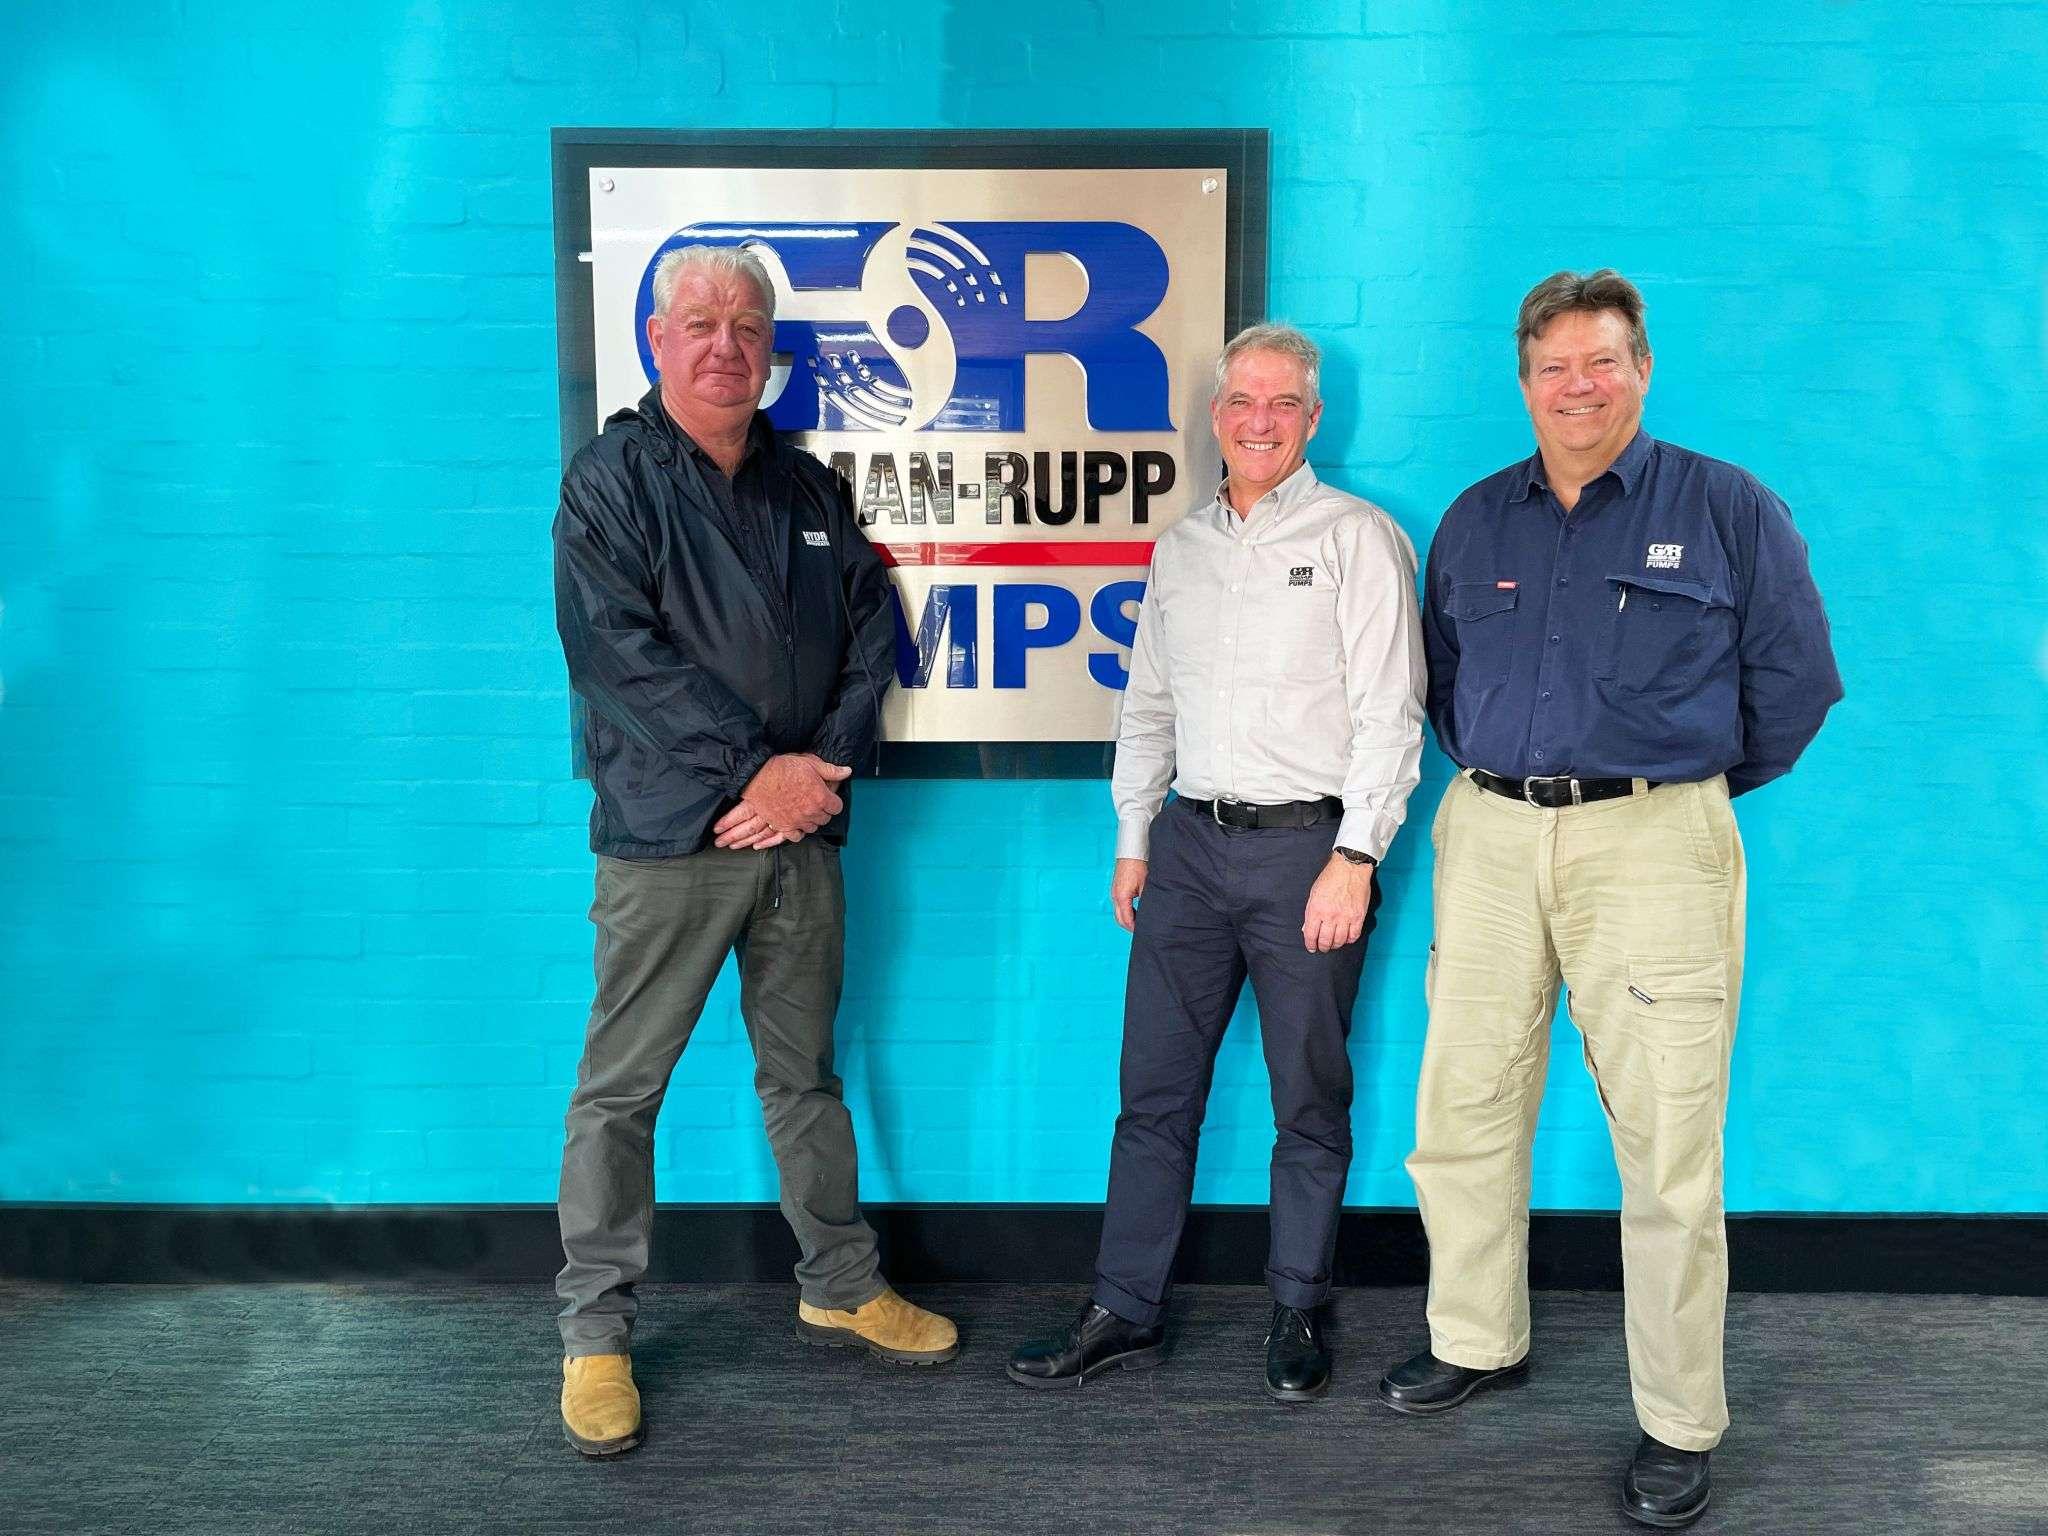 Gorman-Rupp and Hydro Innovations representatives